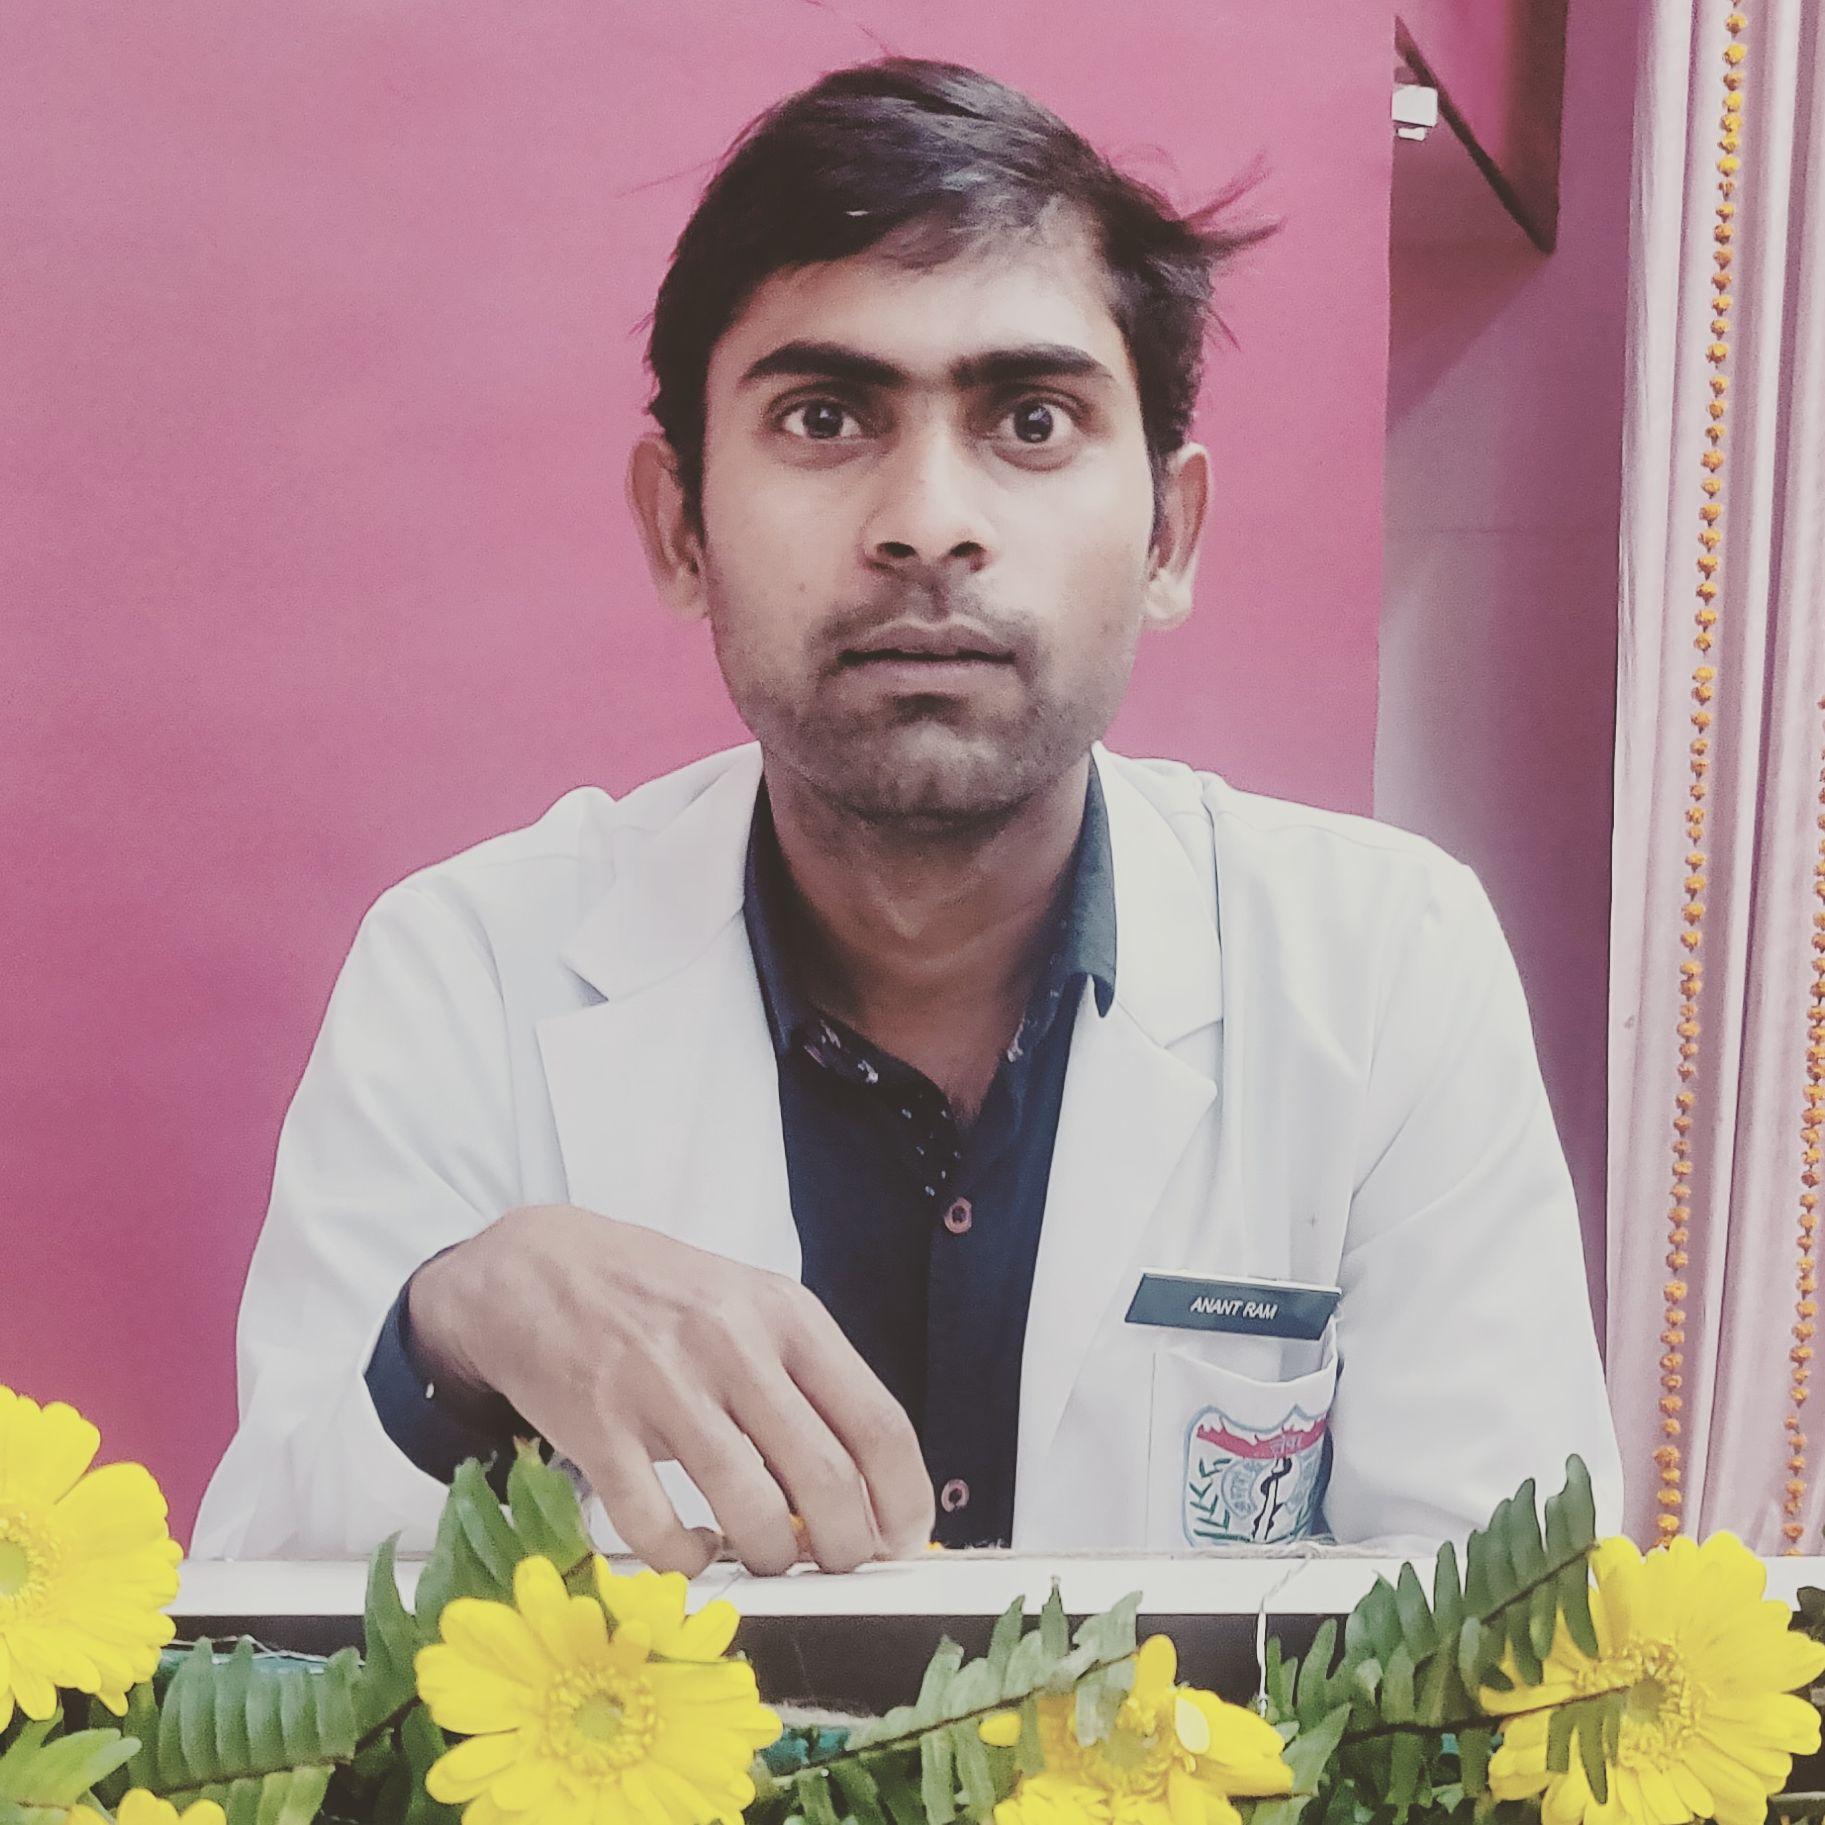 Anant Mishra